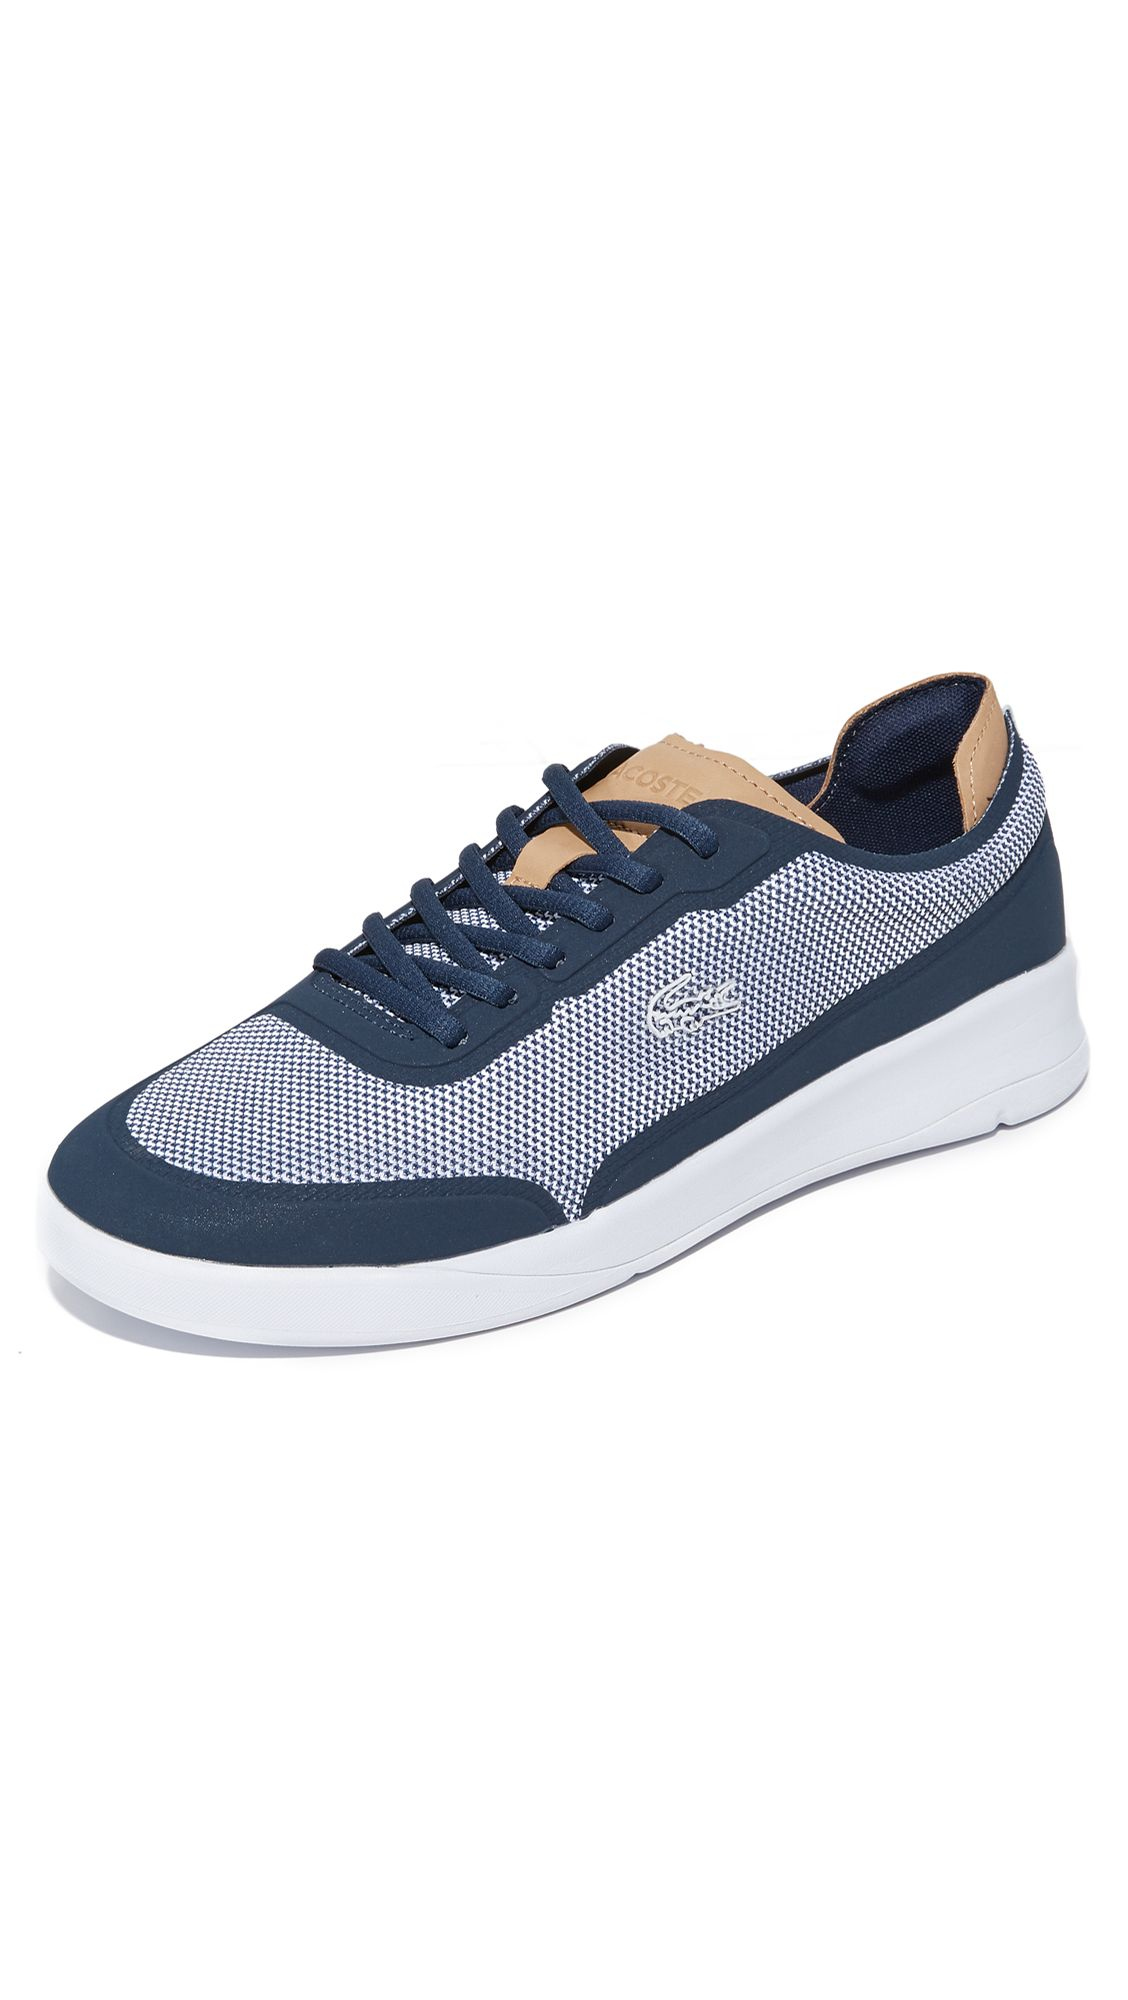 promo code 9c539 7e556 LACOSTE Light Spirit Elite Sneakers.  lacoste  shoes  sneakers